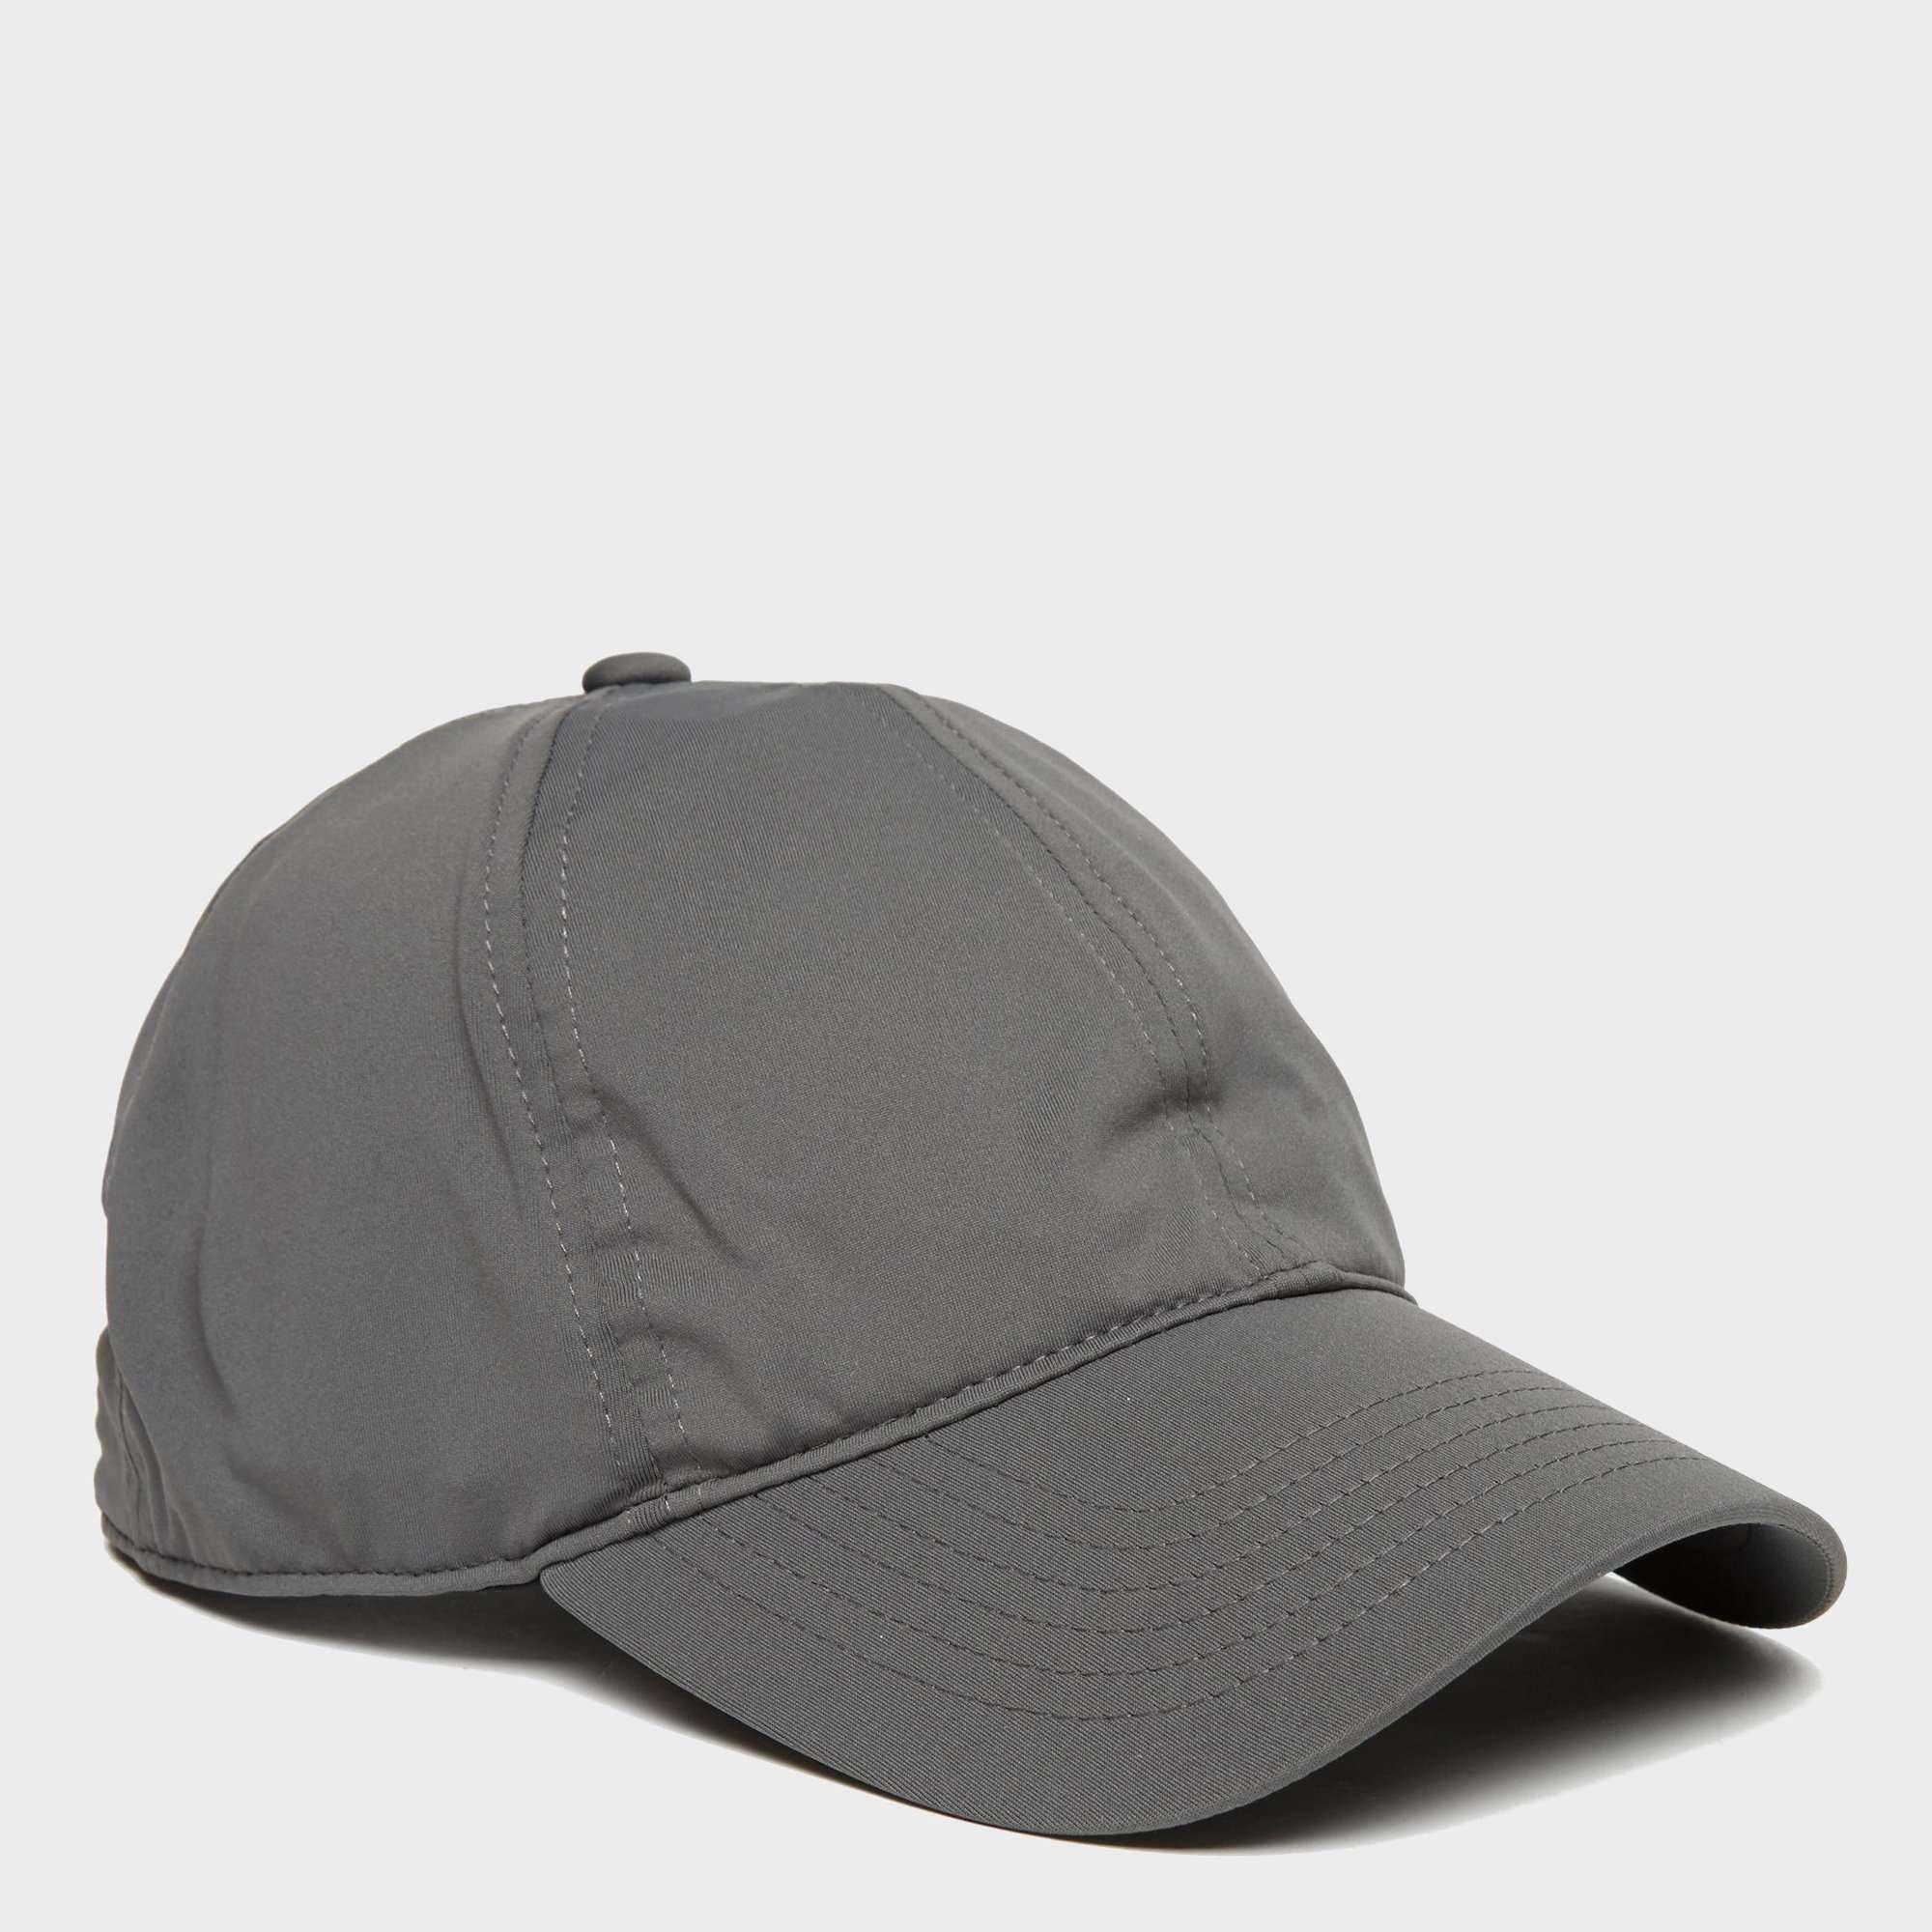 COLUMBIA Men's Coolhead Ball Cap